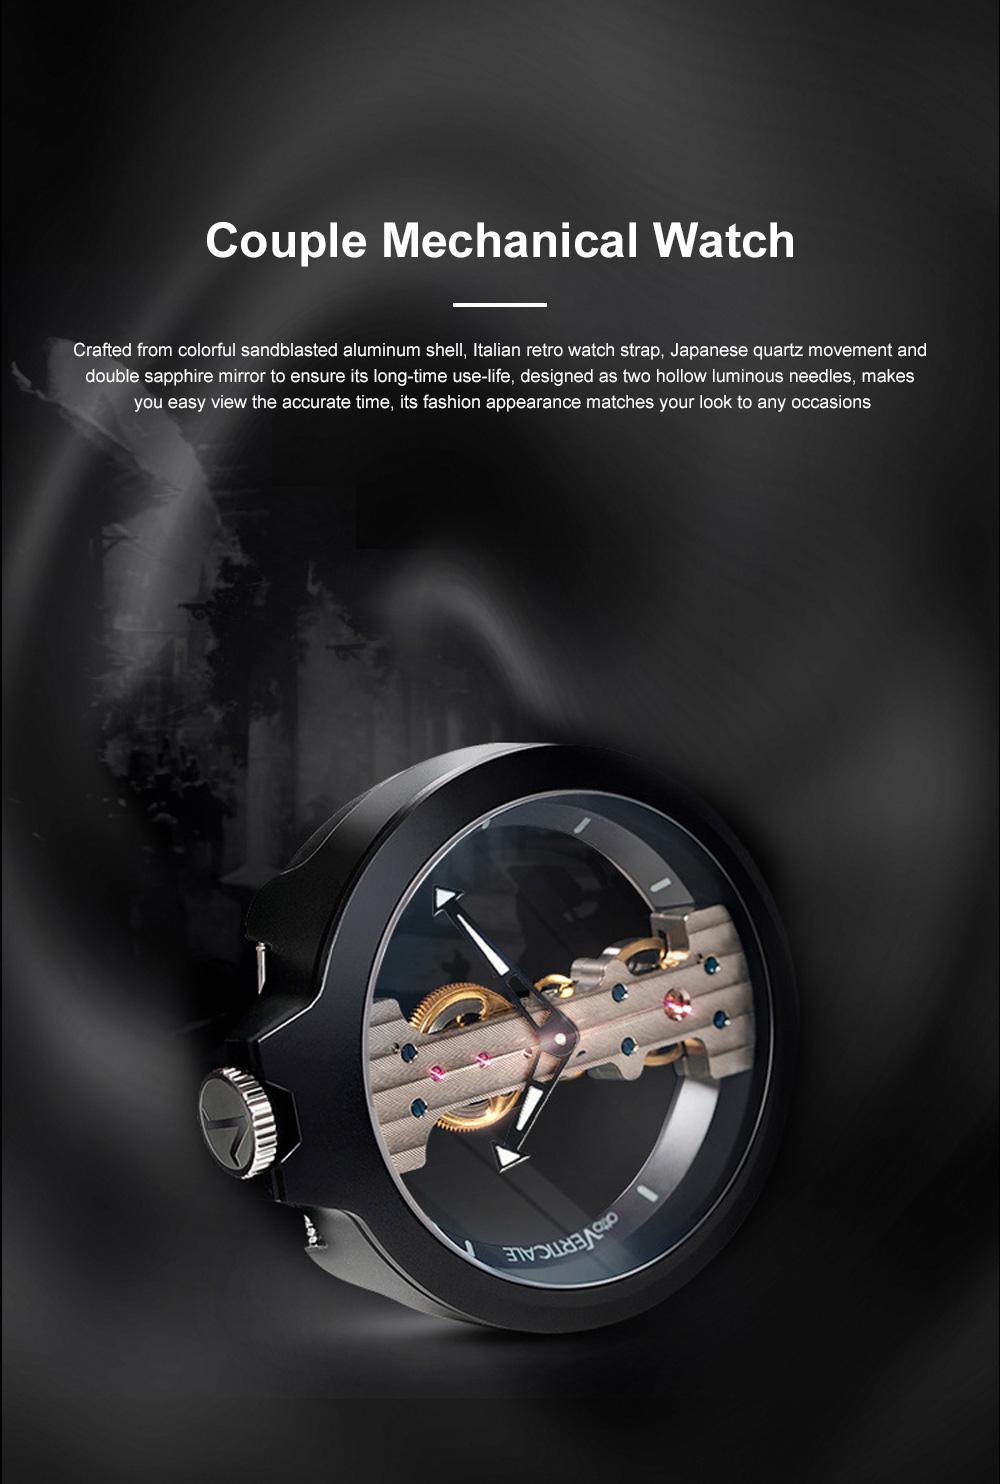 Lovers Mechanical Watch Waterproof Leisure Fashion Wristwatch for Men Women Couple Watch Gift Leather Luminous Needle Vertical Movement 0